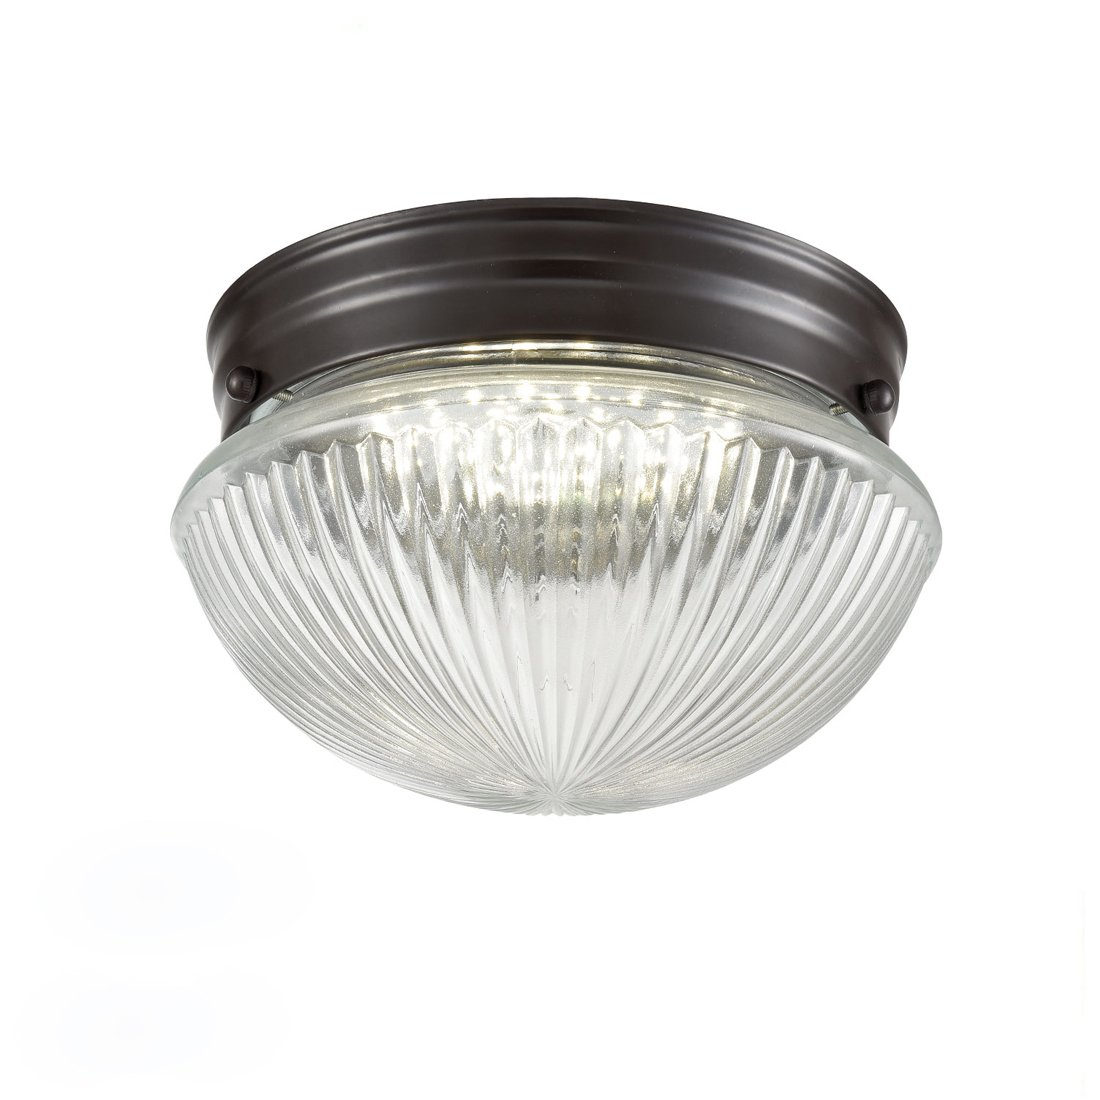 Truelite Industrial Flush Mount Ceiling Light With Glass